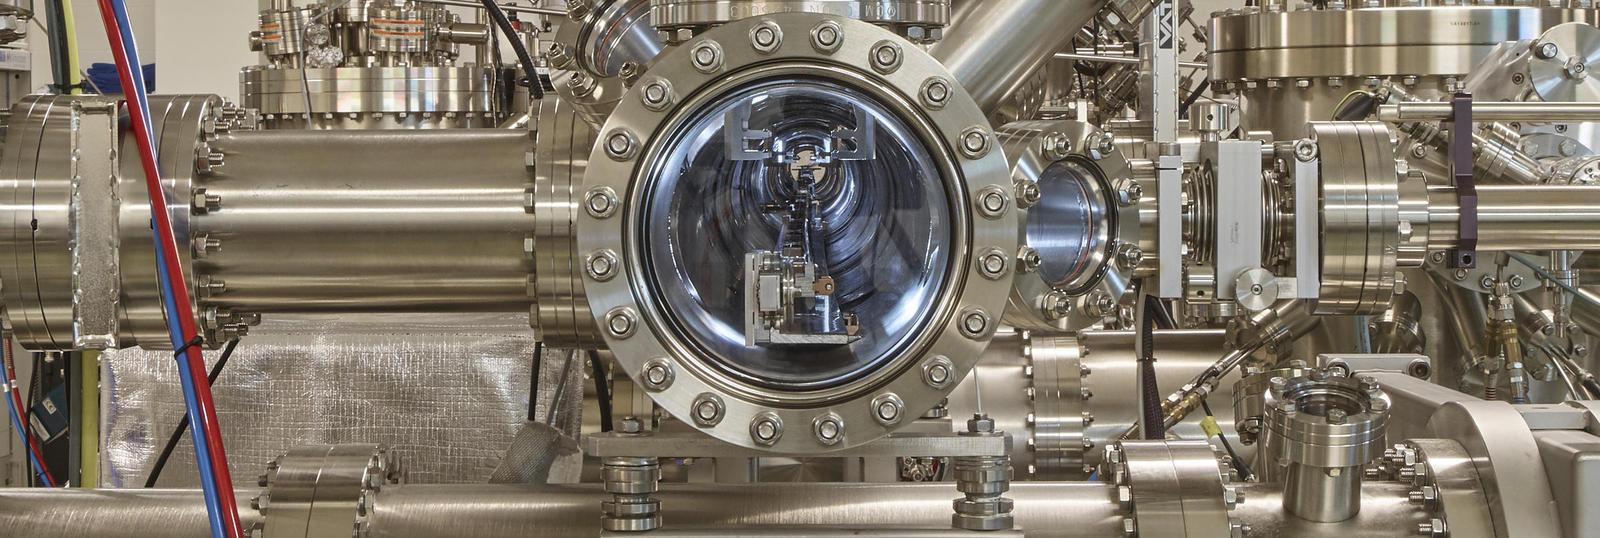 Omicron lab system